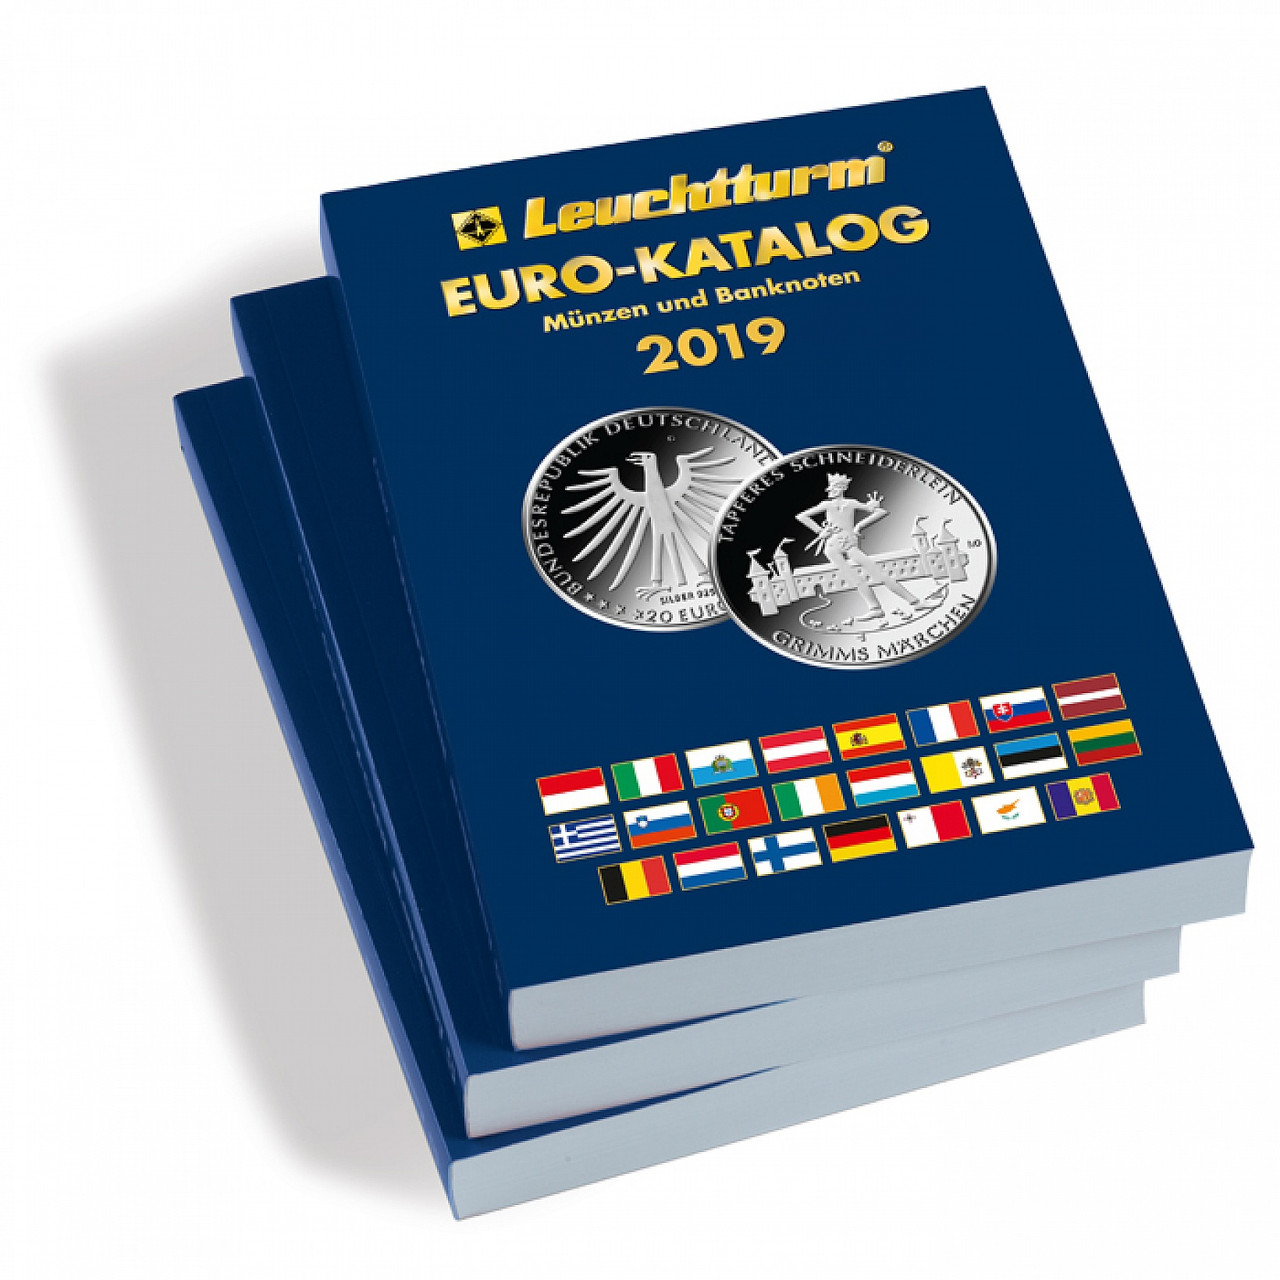 EUROKAT19ENG Полный каталог евромонет 2019 (англ.яз)